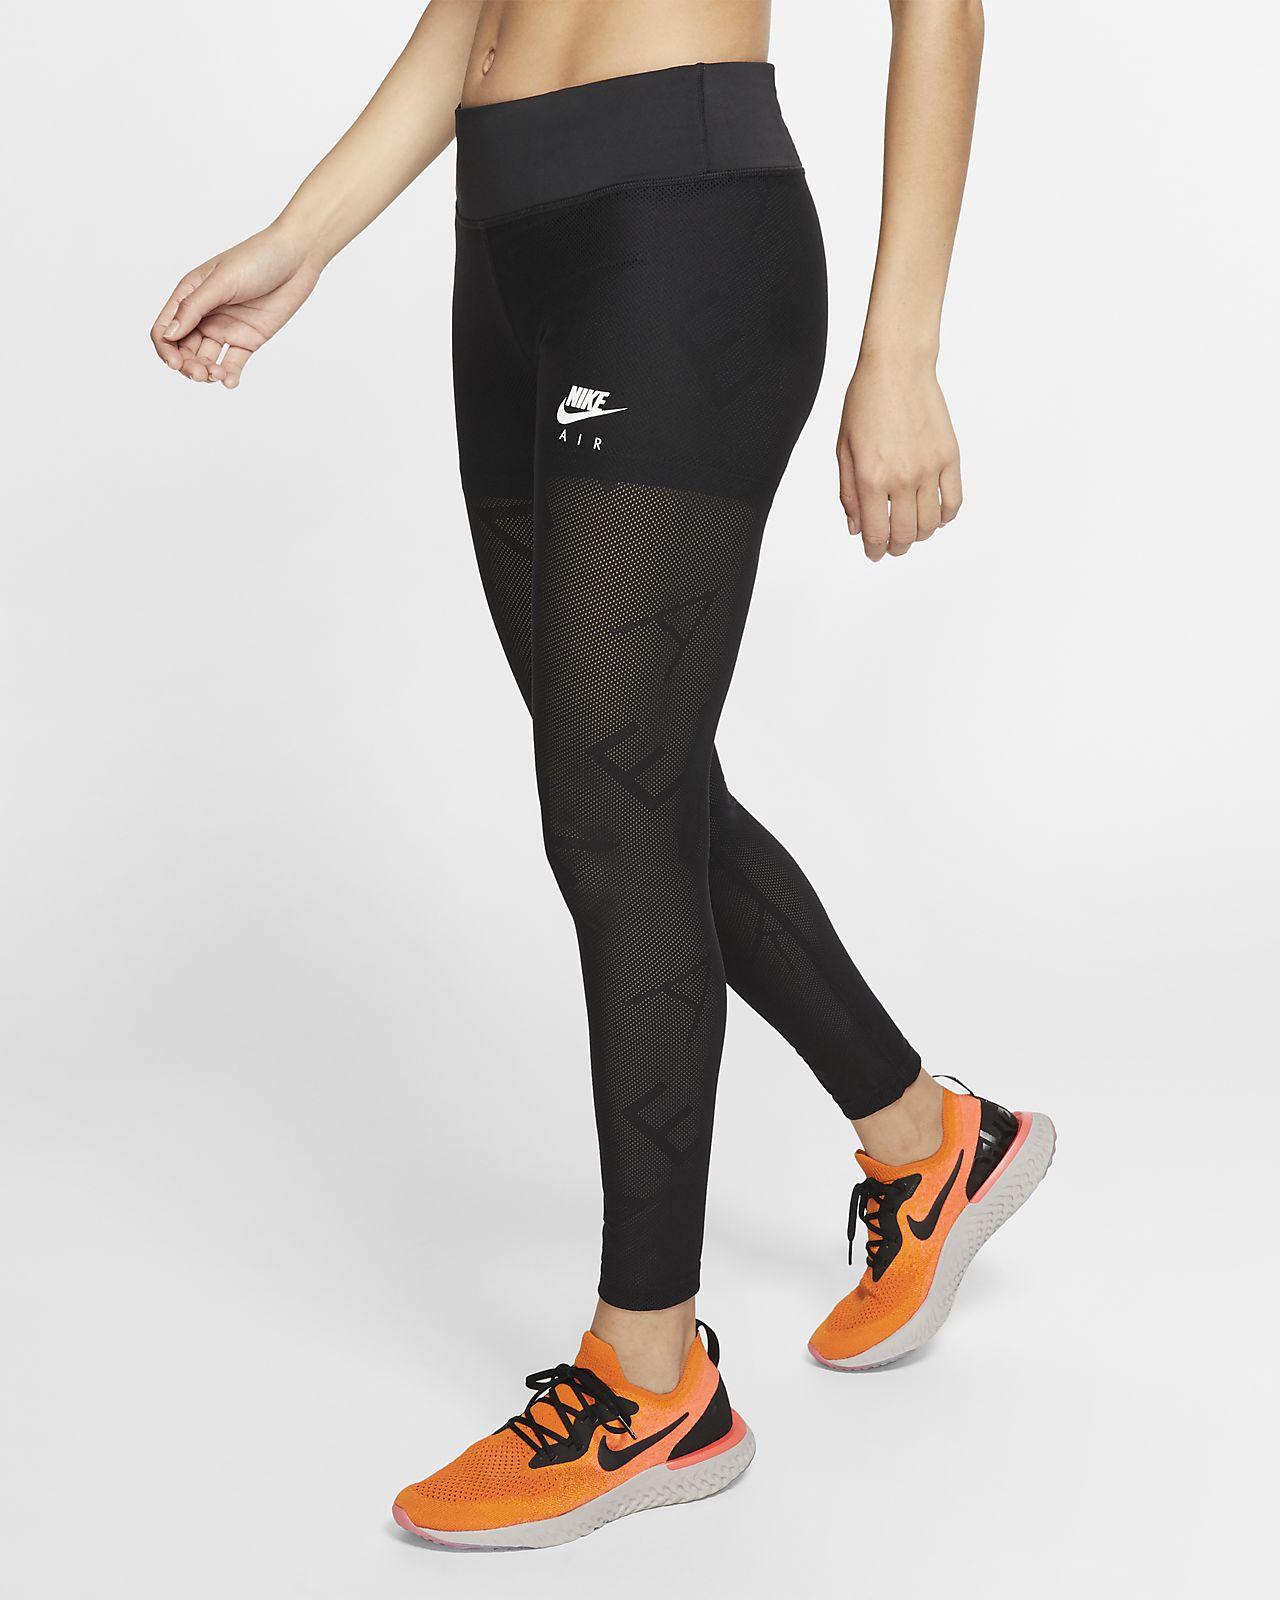 Nike Air 7/8-os hálós testhezálló női futónadrág